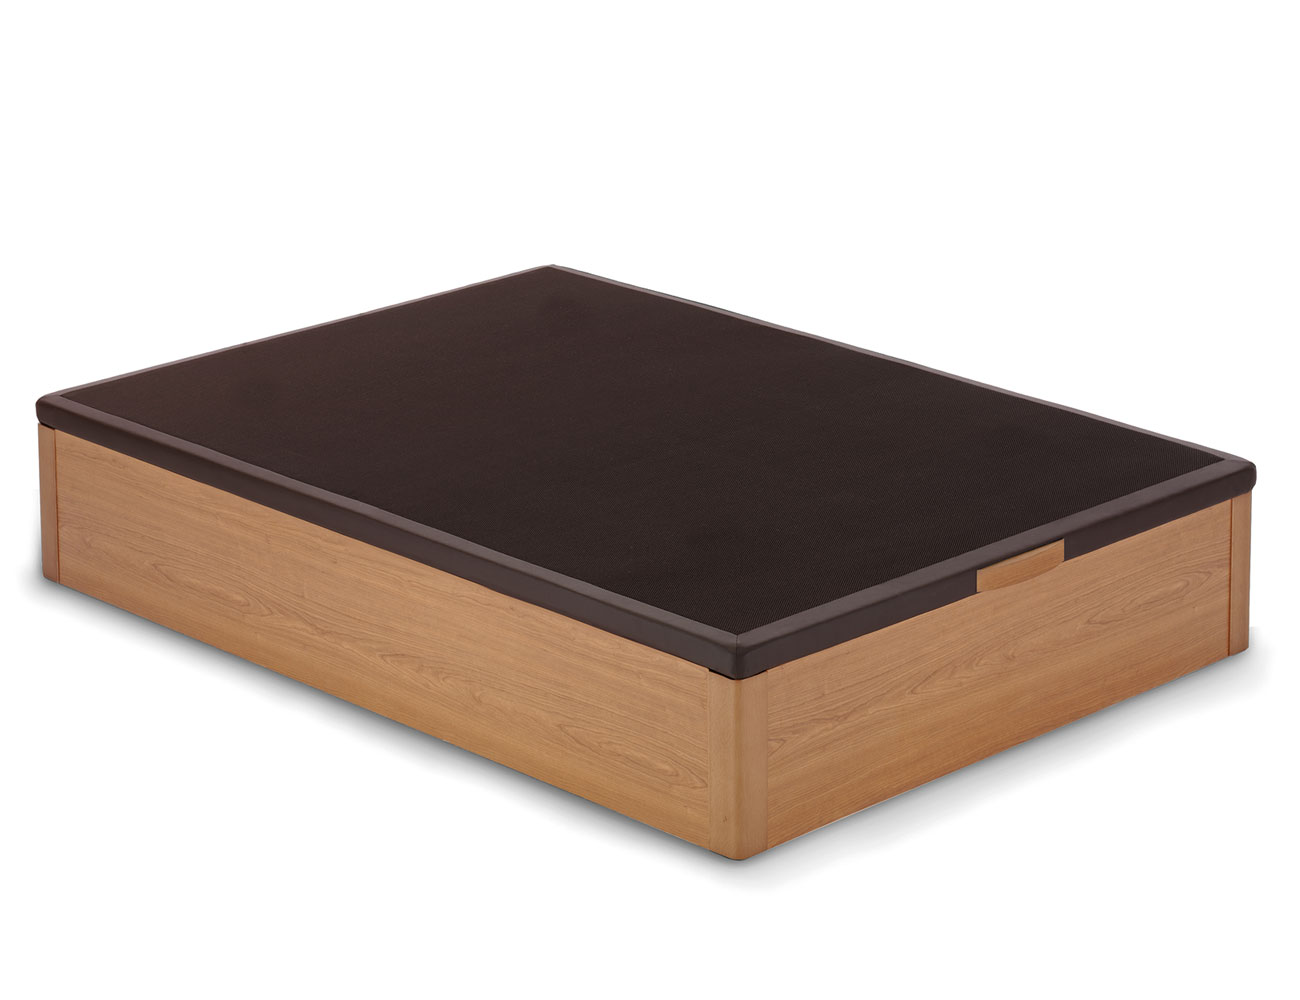 Canape madera 5 cm grosor gran calidad10